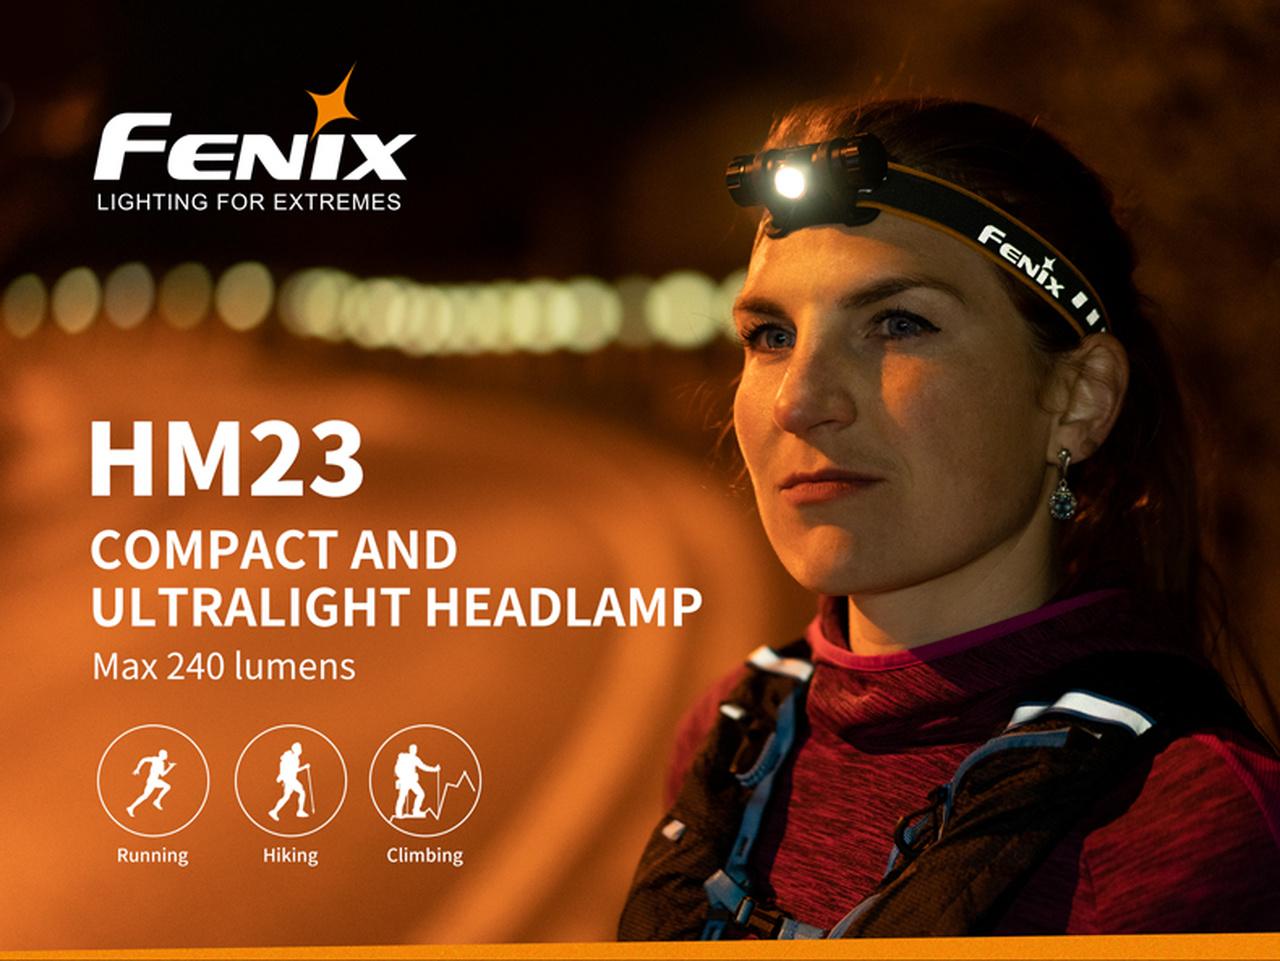 Fenix Fenix HM23 Headlamp